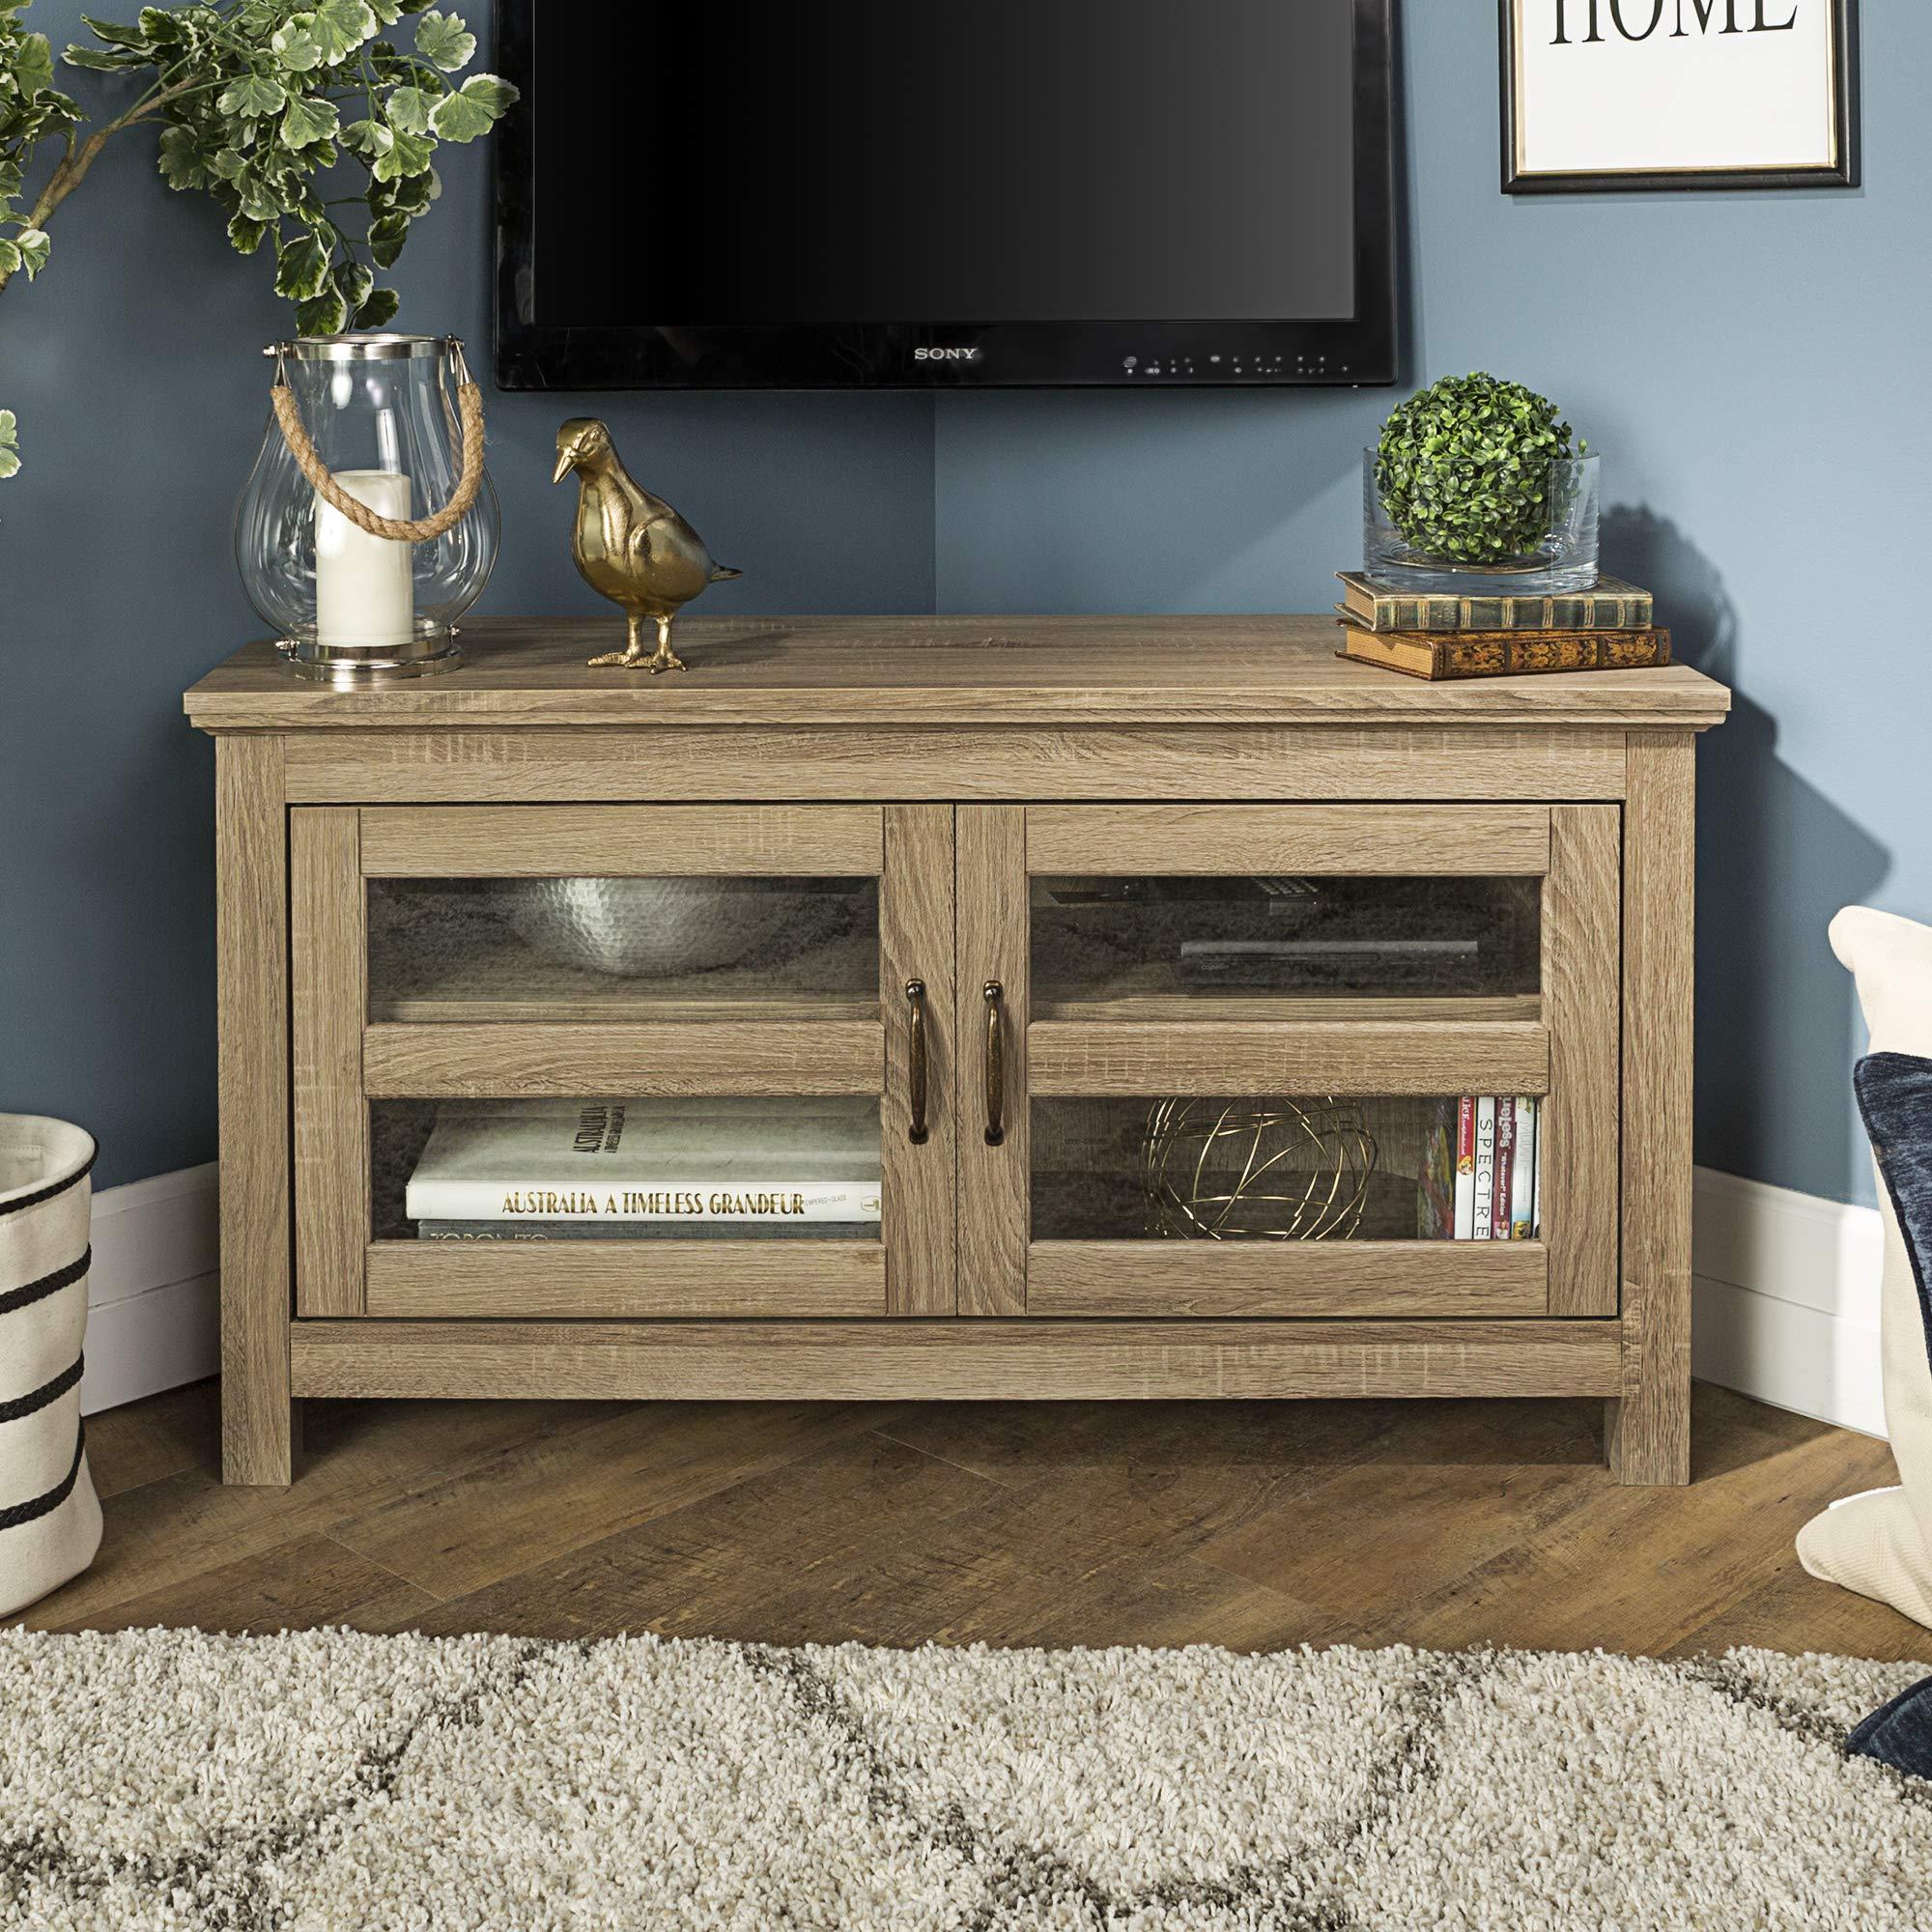 WE Furniture AZ44CCRAG-P 2 Door Cabinet Corner Wood Stand for TV's up to 48'' Living Room Storage, 44'', Grey/Brown by WE Furniture